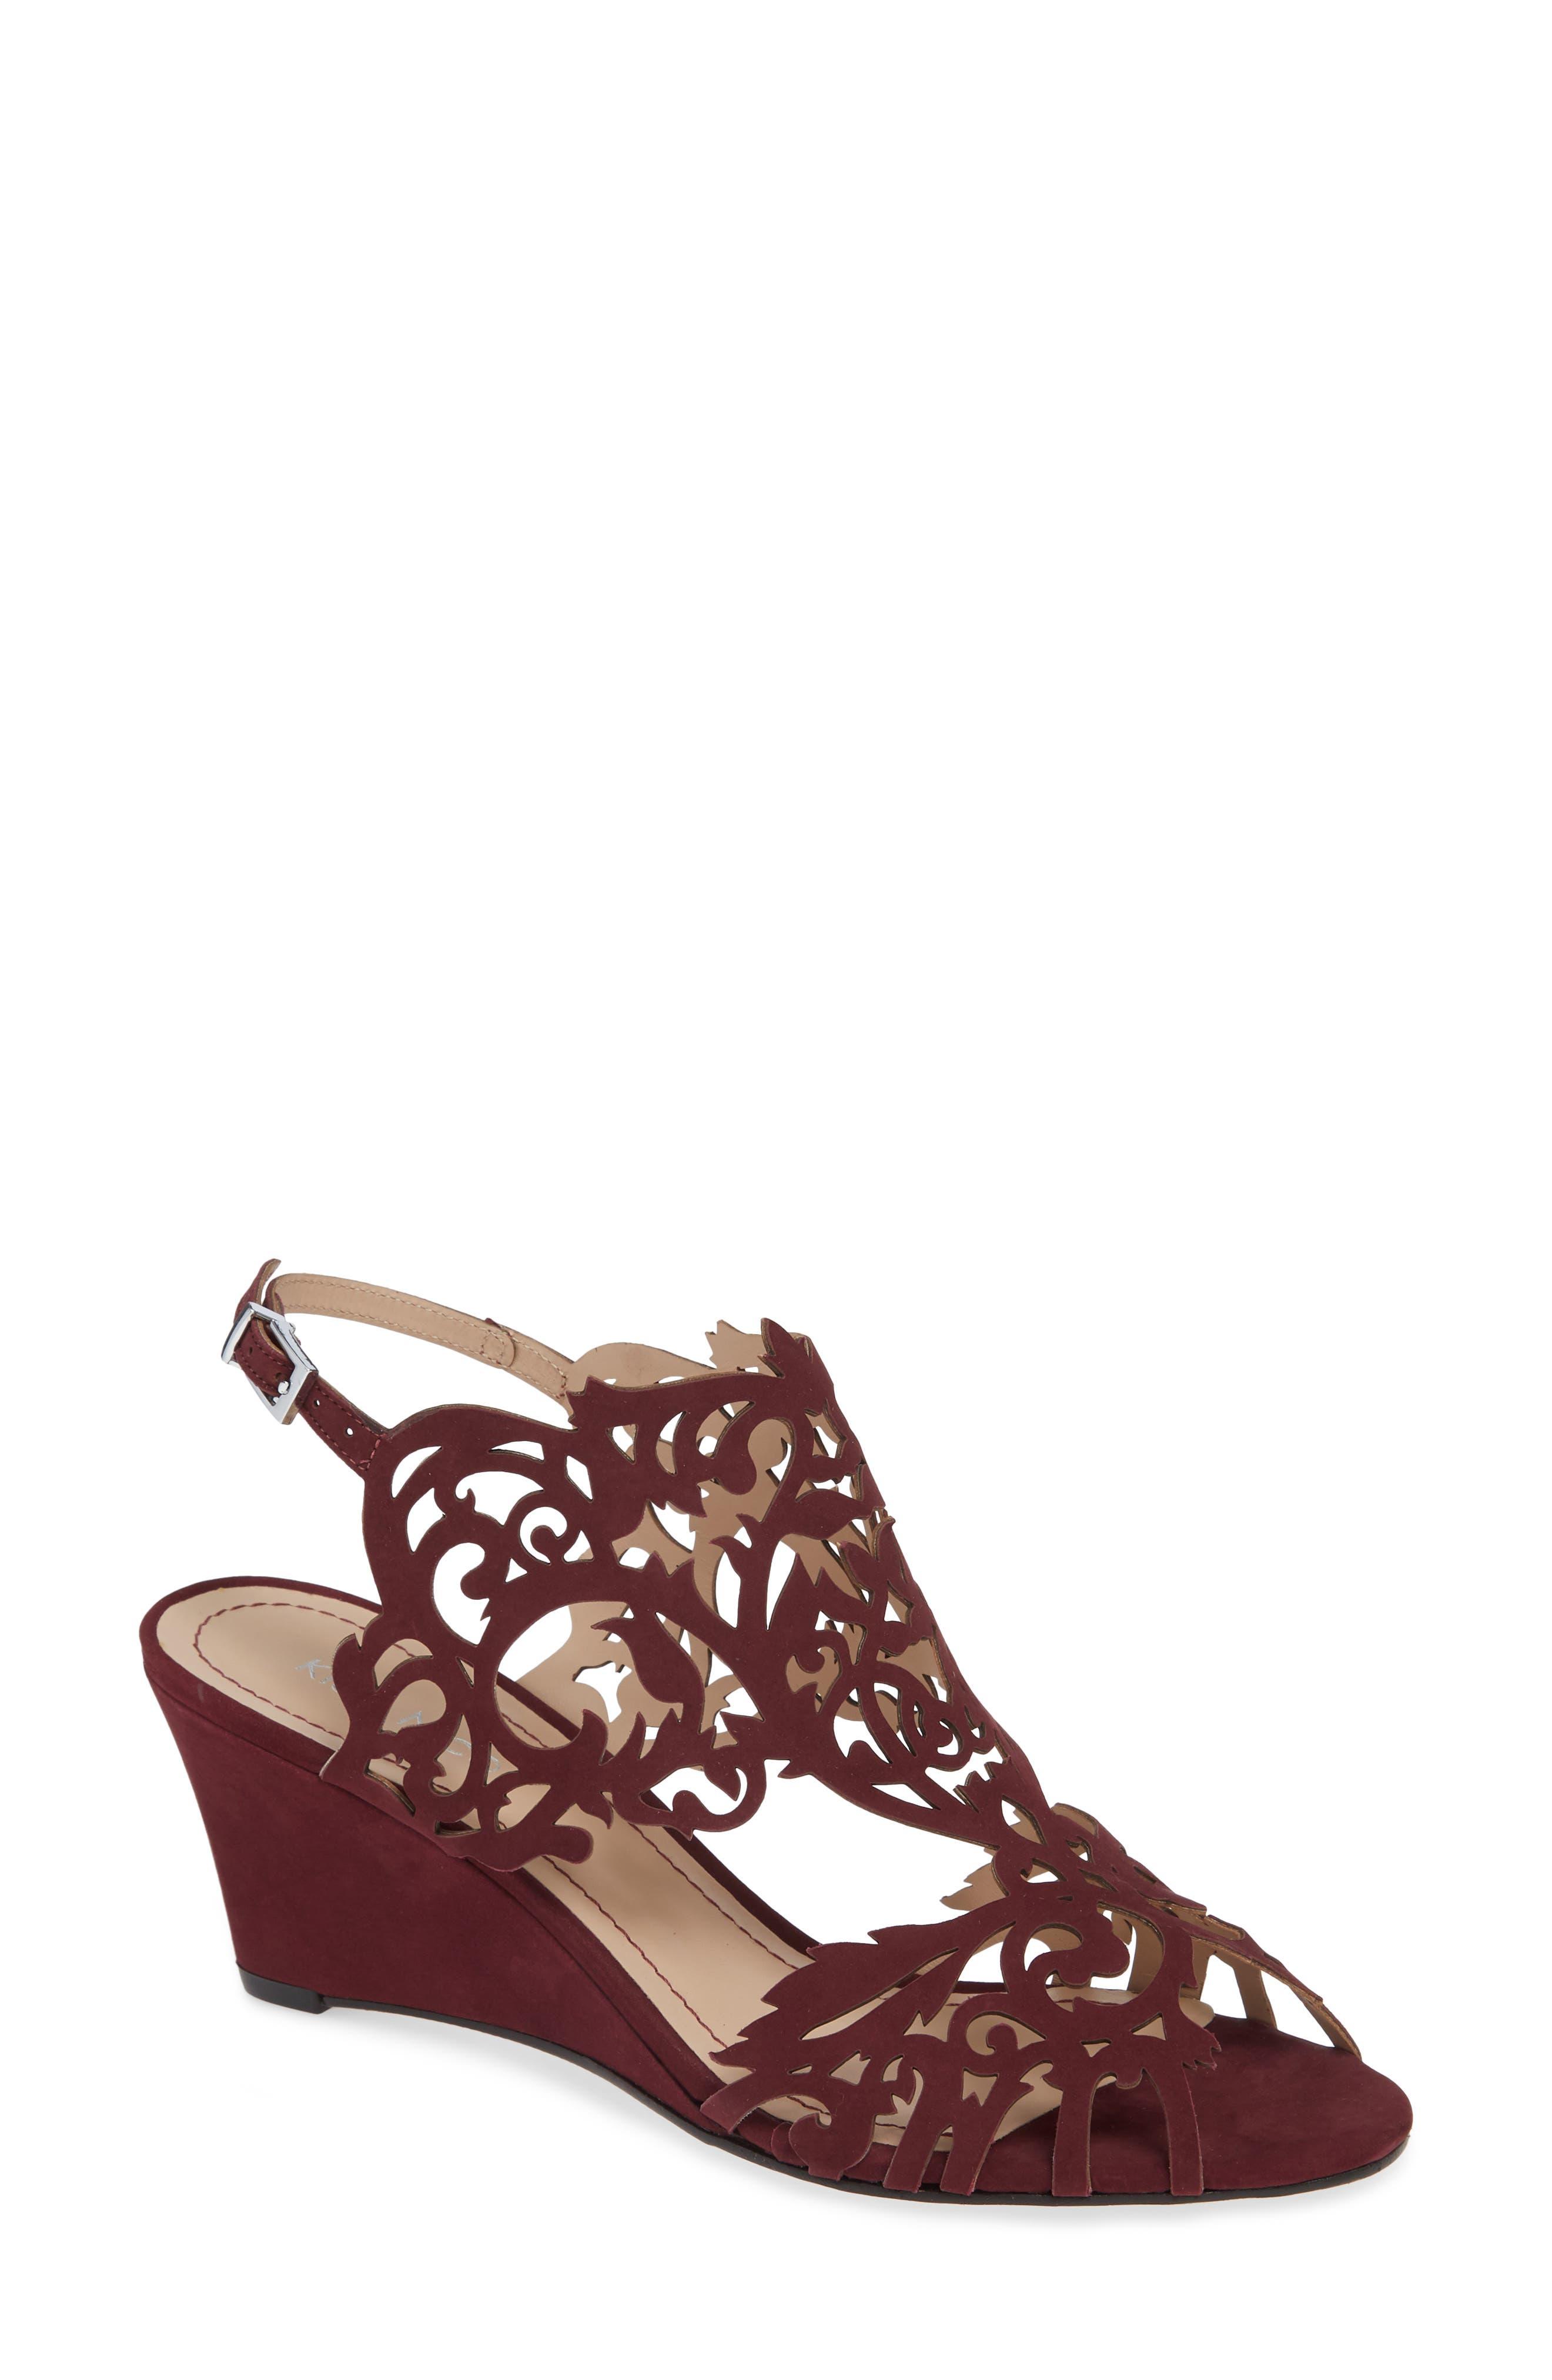 Marcela Laser Cutout Wedge Sandal,                             Main thumbnail 1, color,                             WINE LEATHER